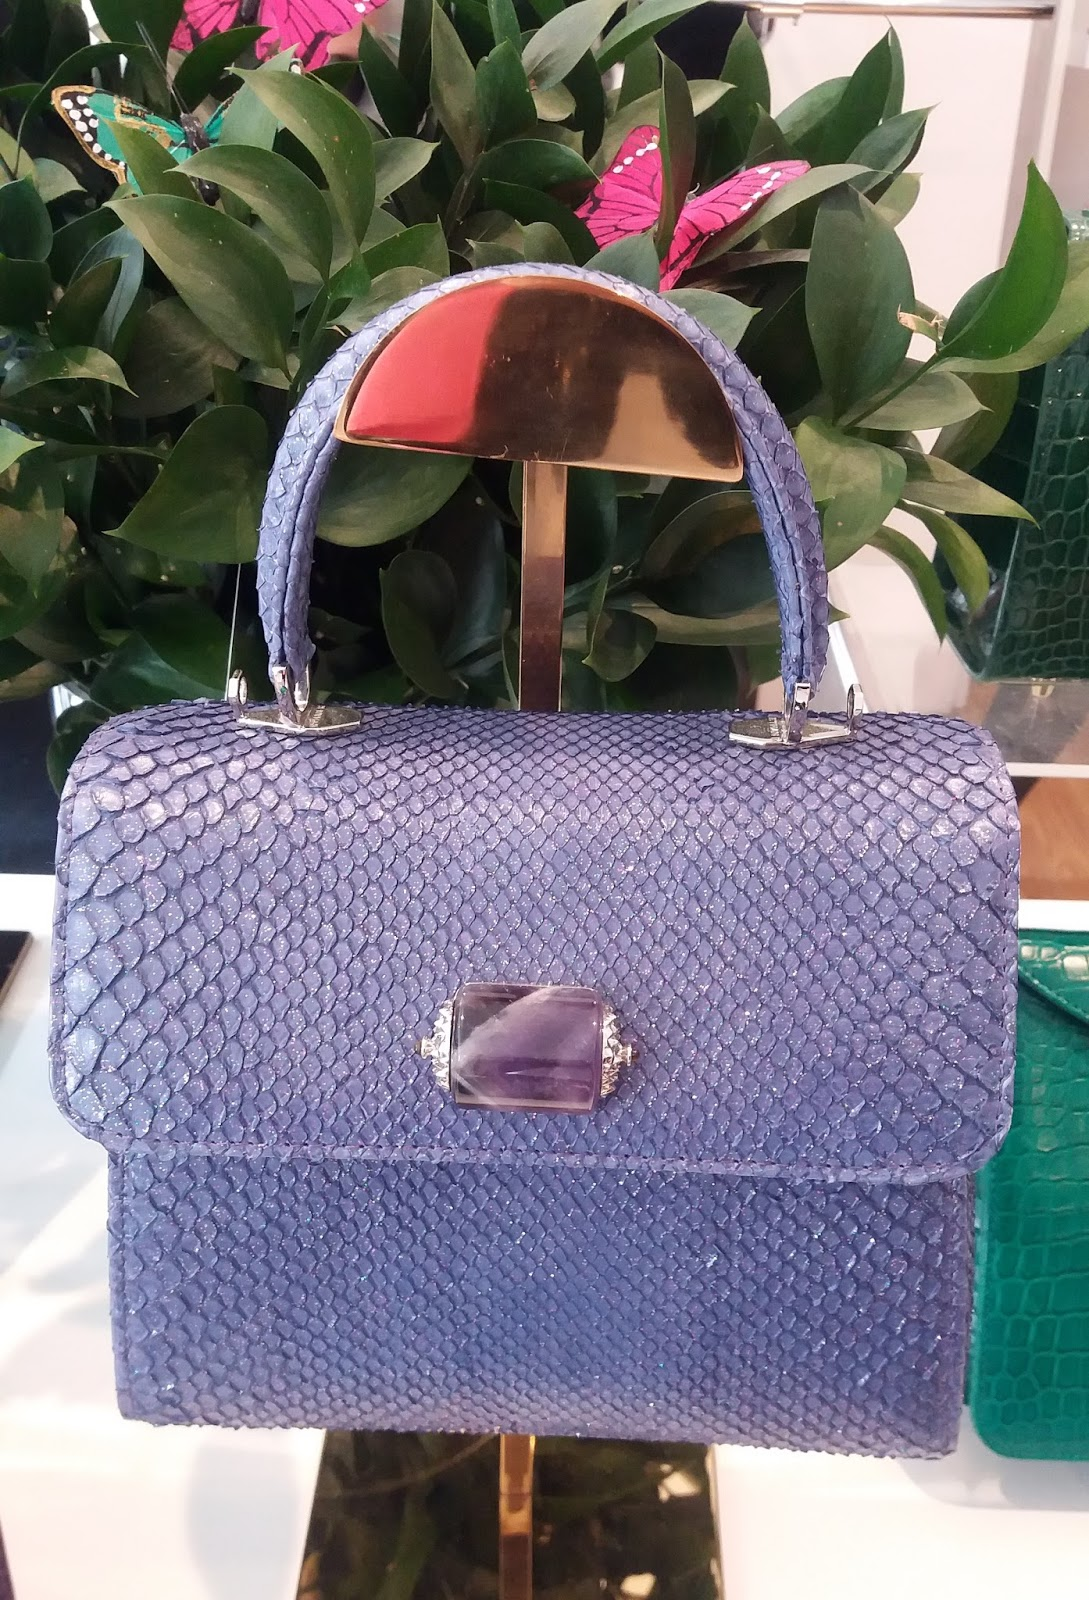 Statement Bag - Sky Ocean Beauty by VIDA VIDA zxad7Ww